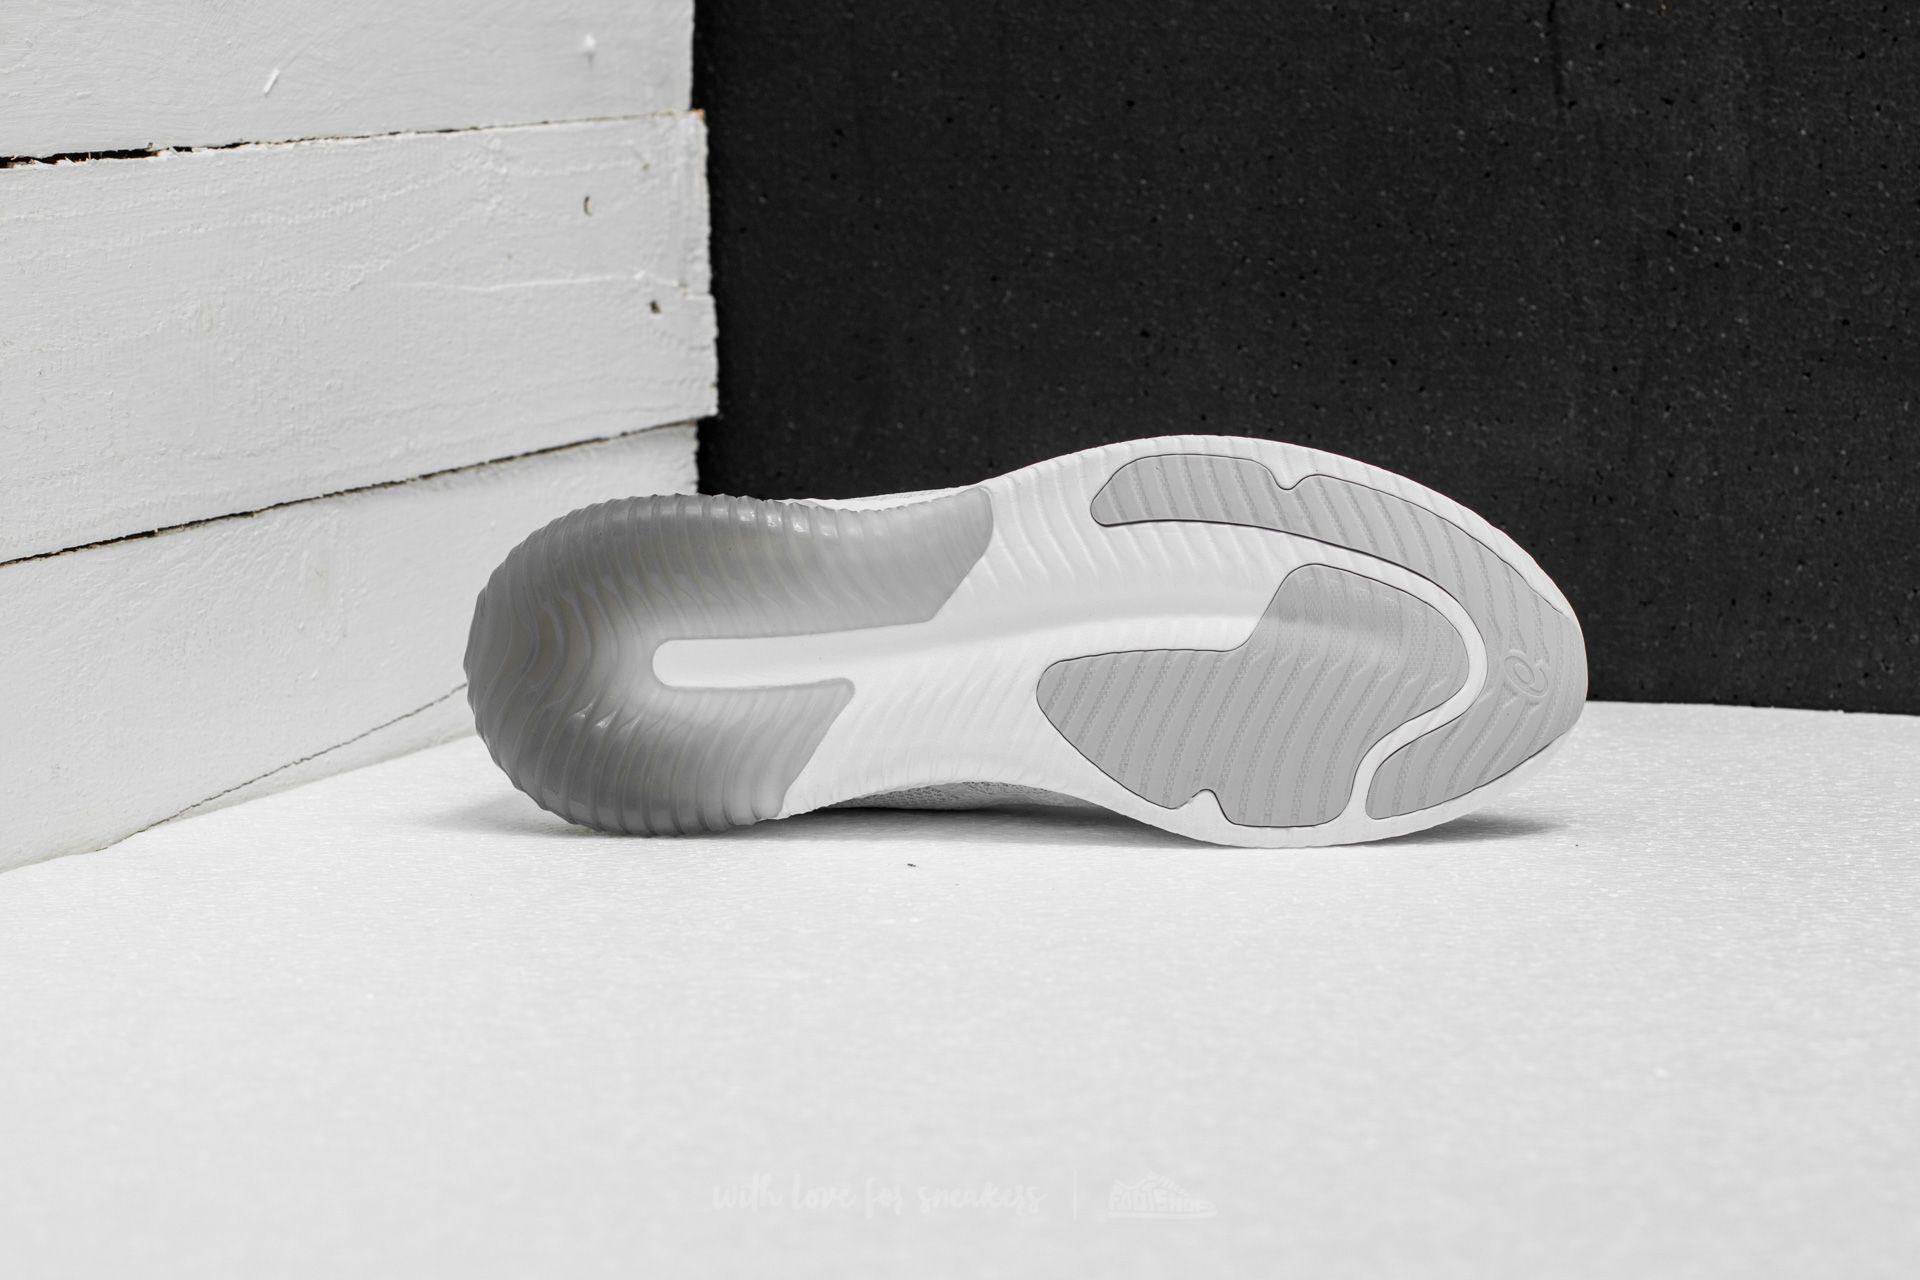 Asics Gel-Kenun White  White  Glacier Grey pour le meilleur prix 100 ... b33d6575c